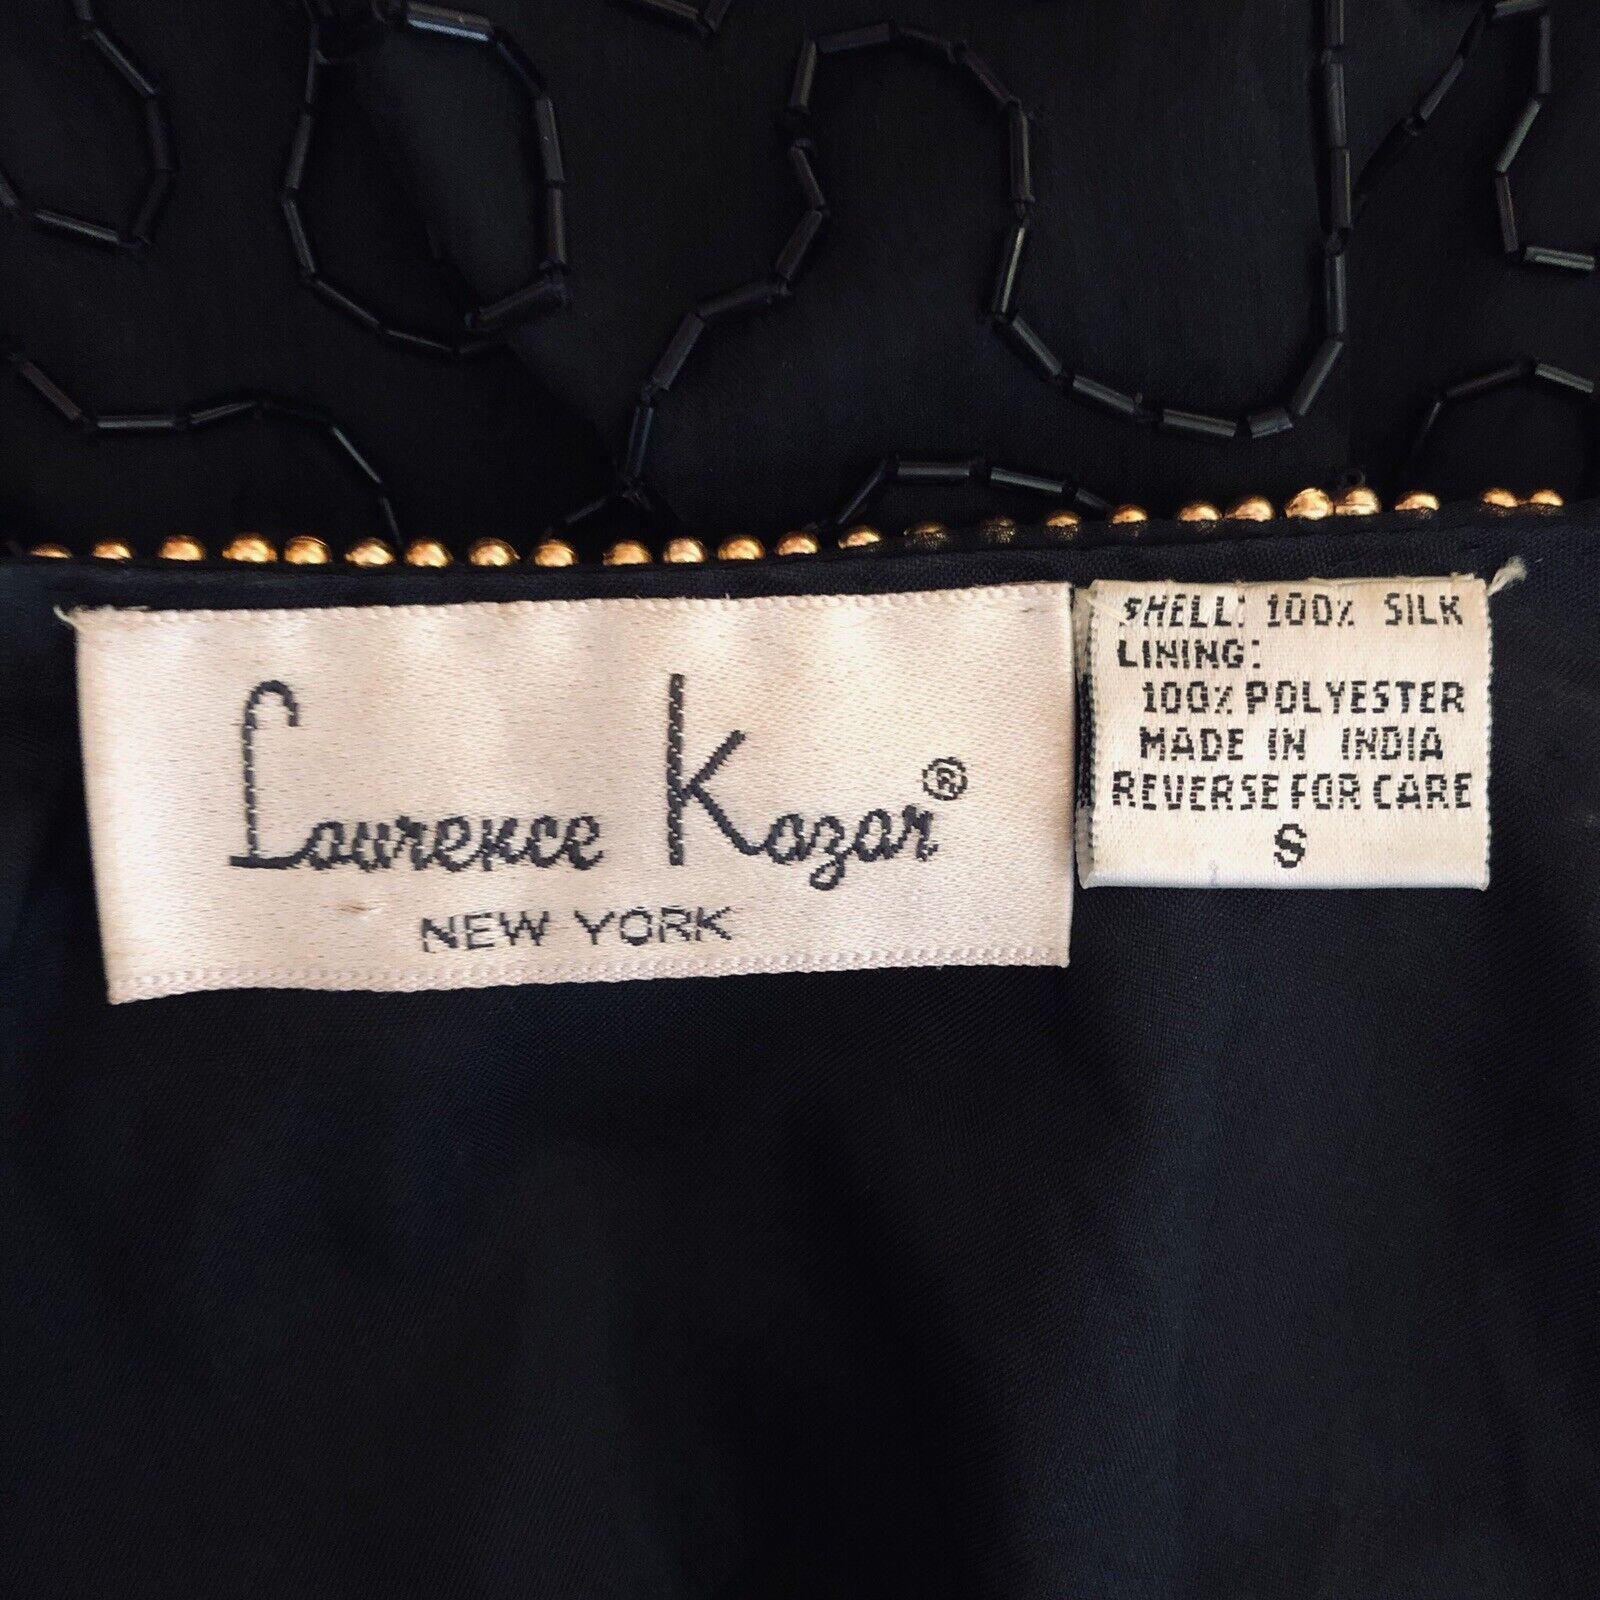 Laurence Kazar Vintage Seta Giacca da Sera Tunica Donna Donna Donna TAGLIA S Perline 195600